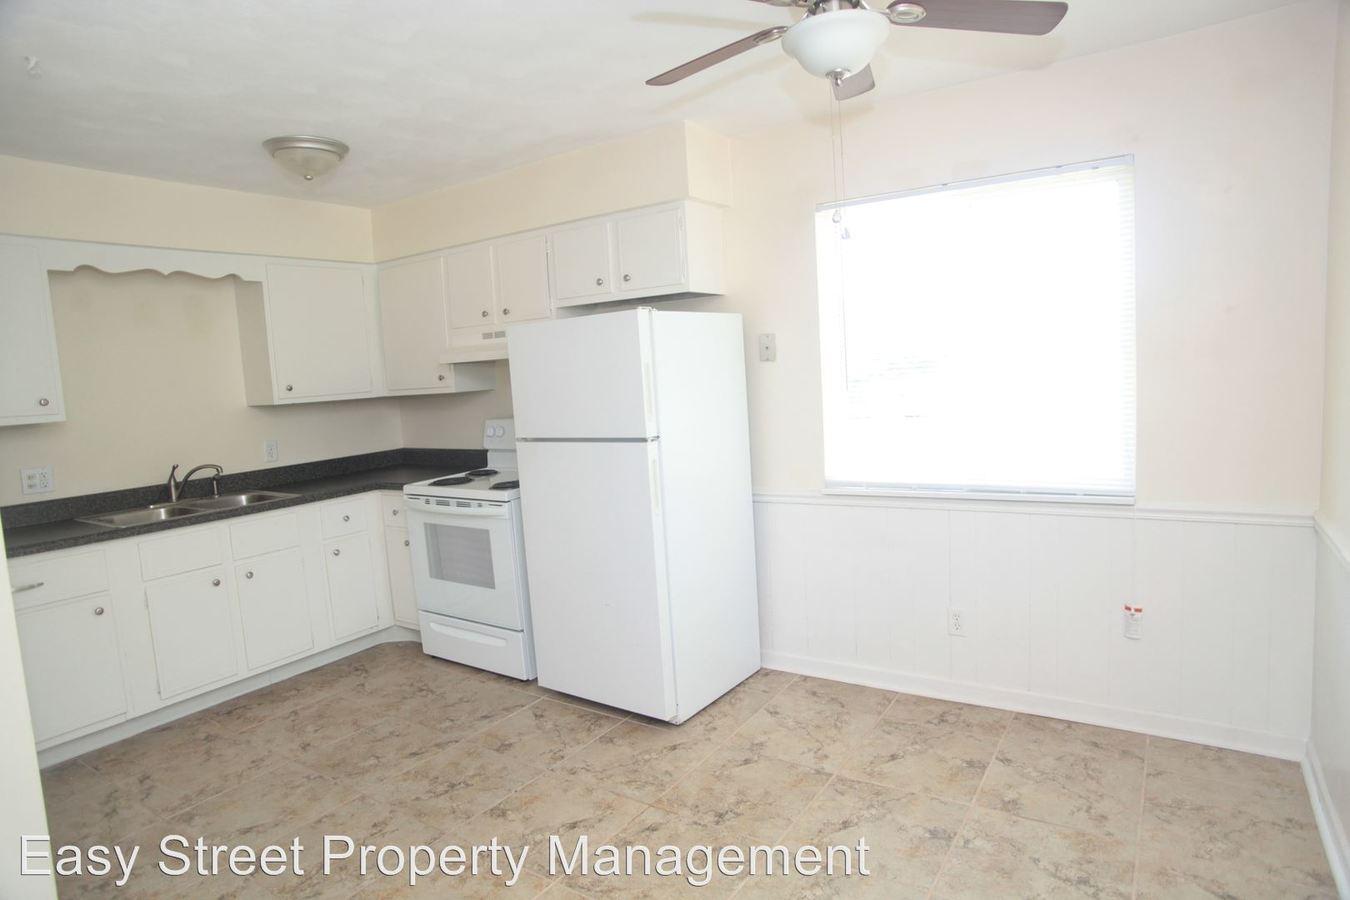 2 Bedrooms 1 Bathroom Apartment for rent at 728 W Donahue in Eldridge, IA